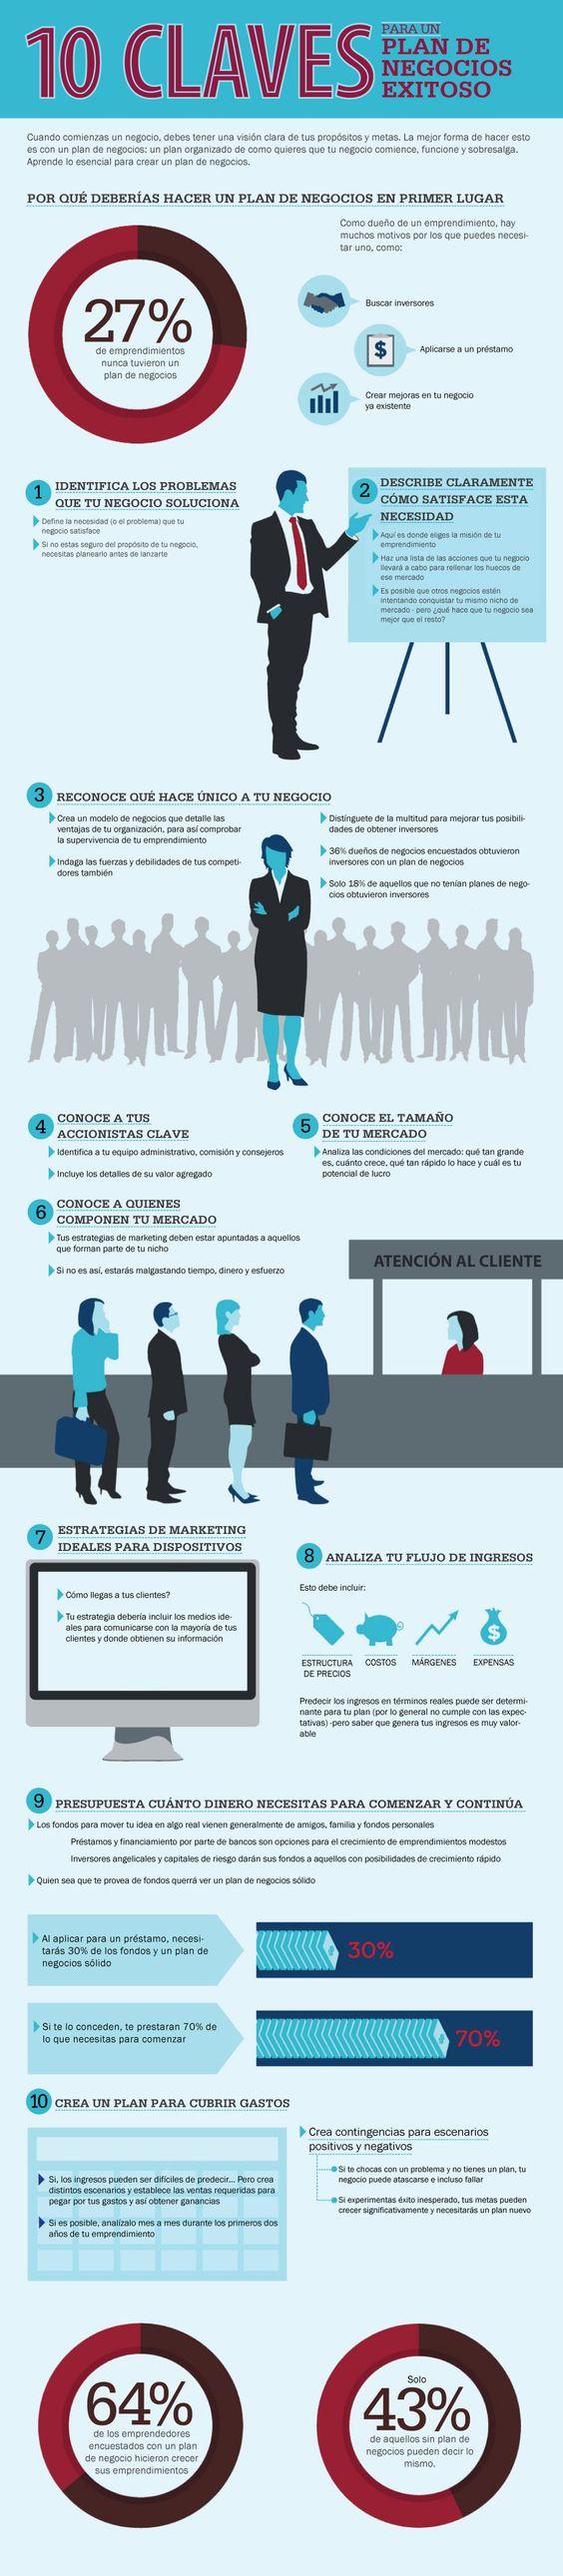 10 Claves para un plan de negocios exitoso